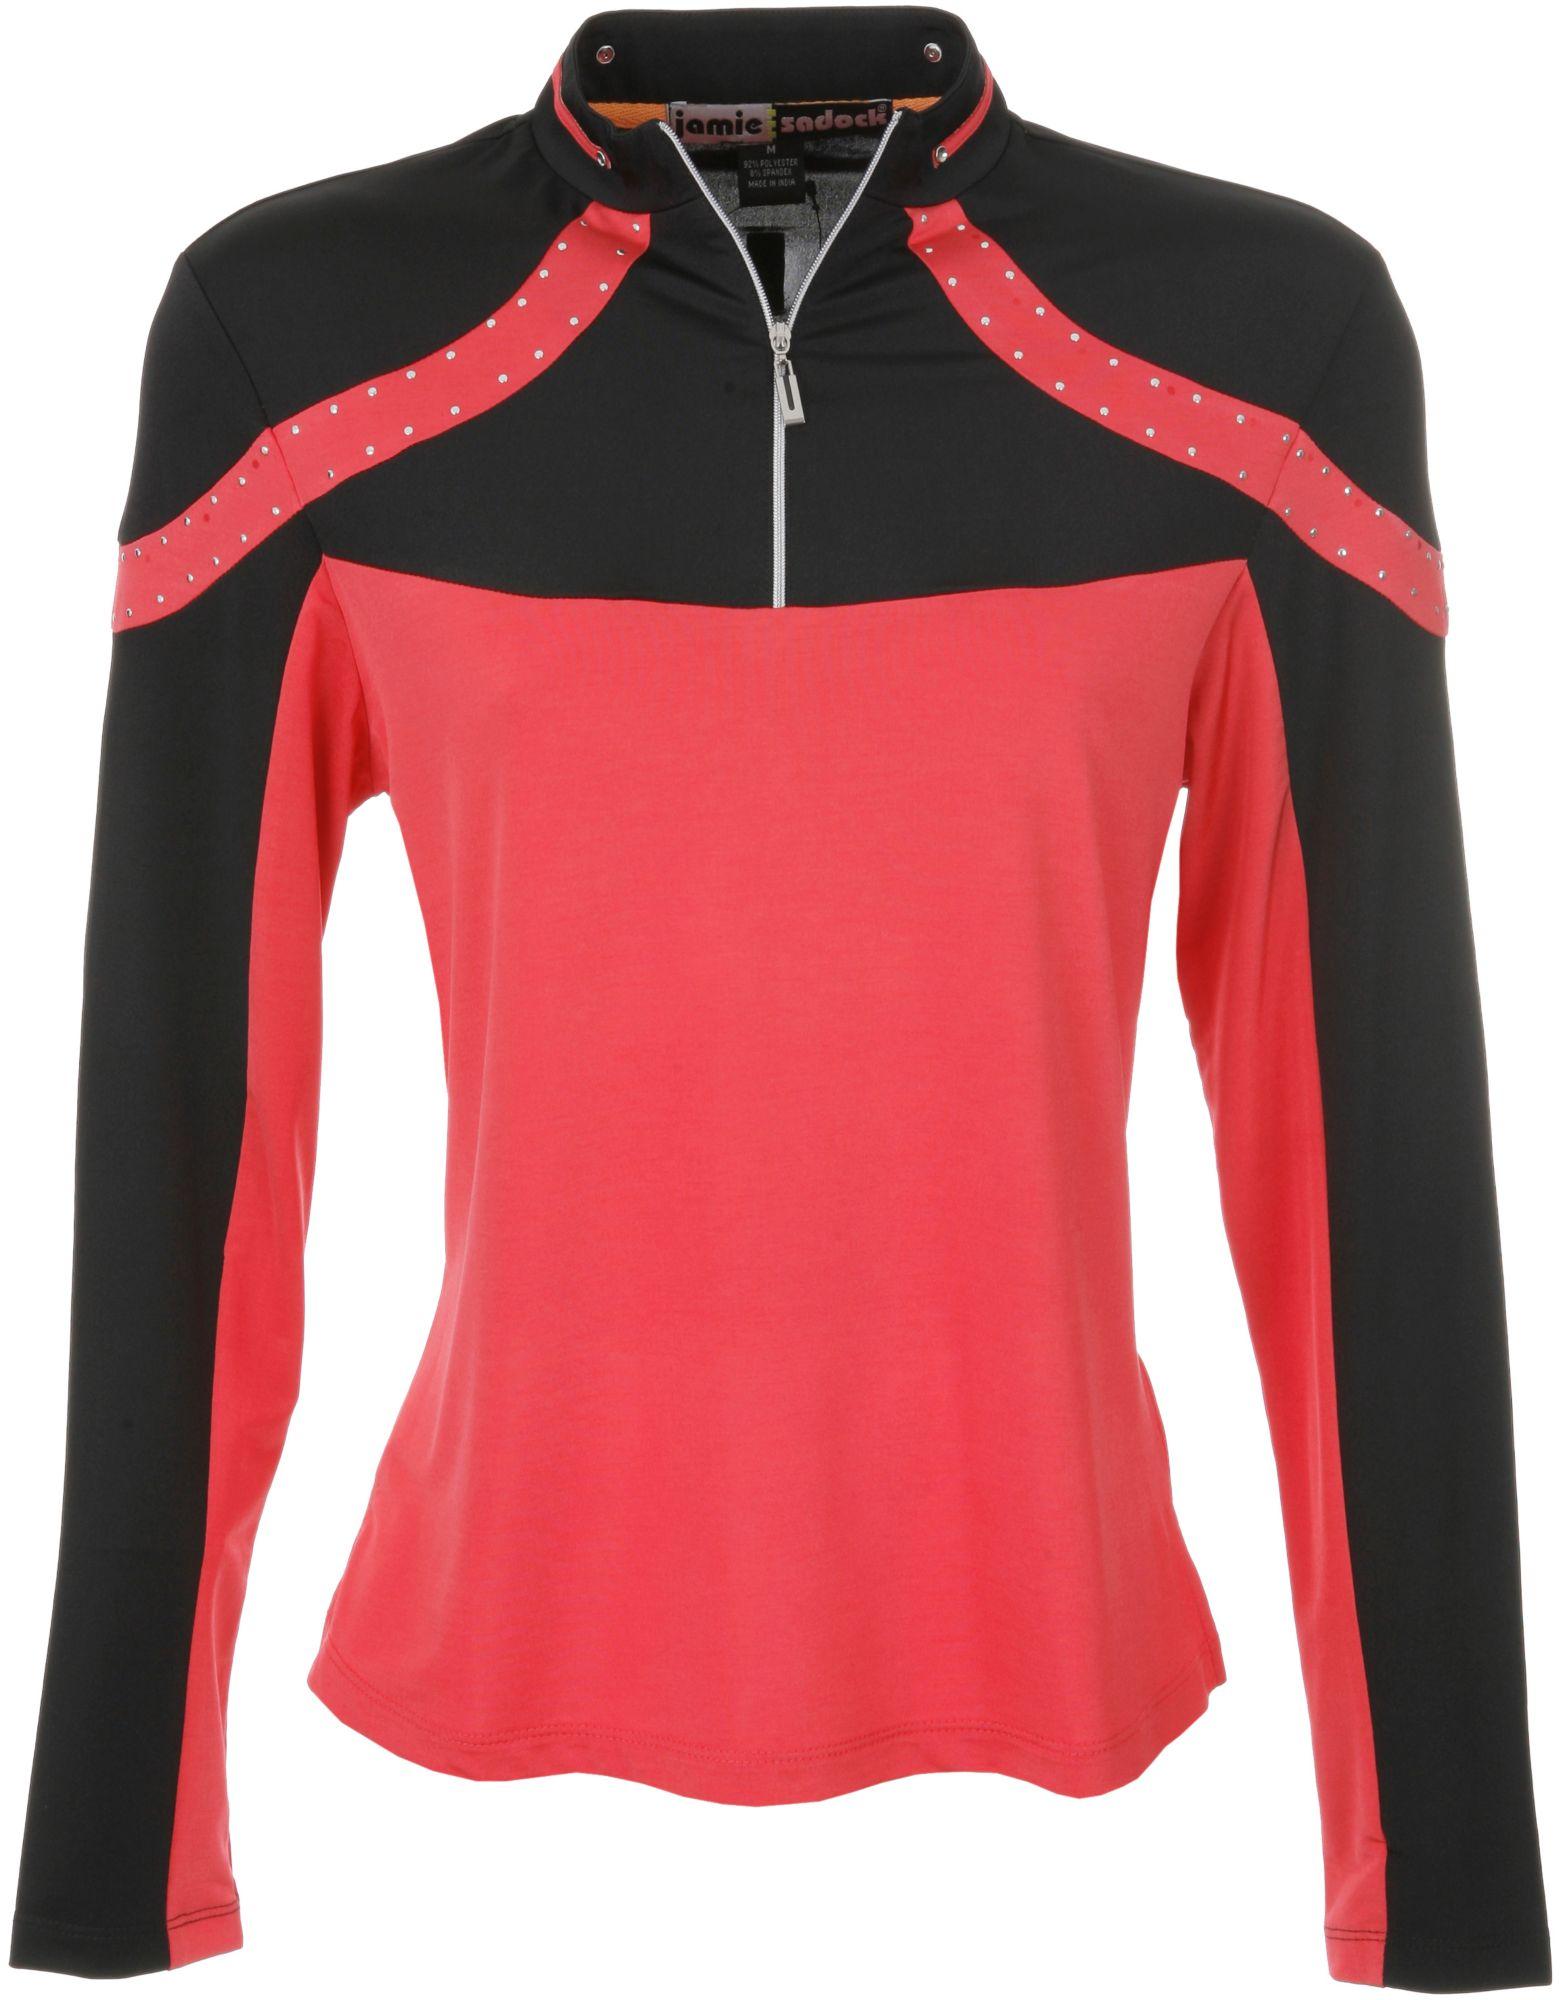 Jamie Sadock Women's Tabasco Red Blocked Long Sleeve Polo